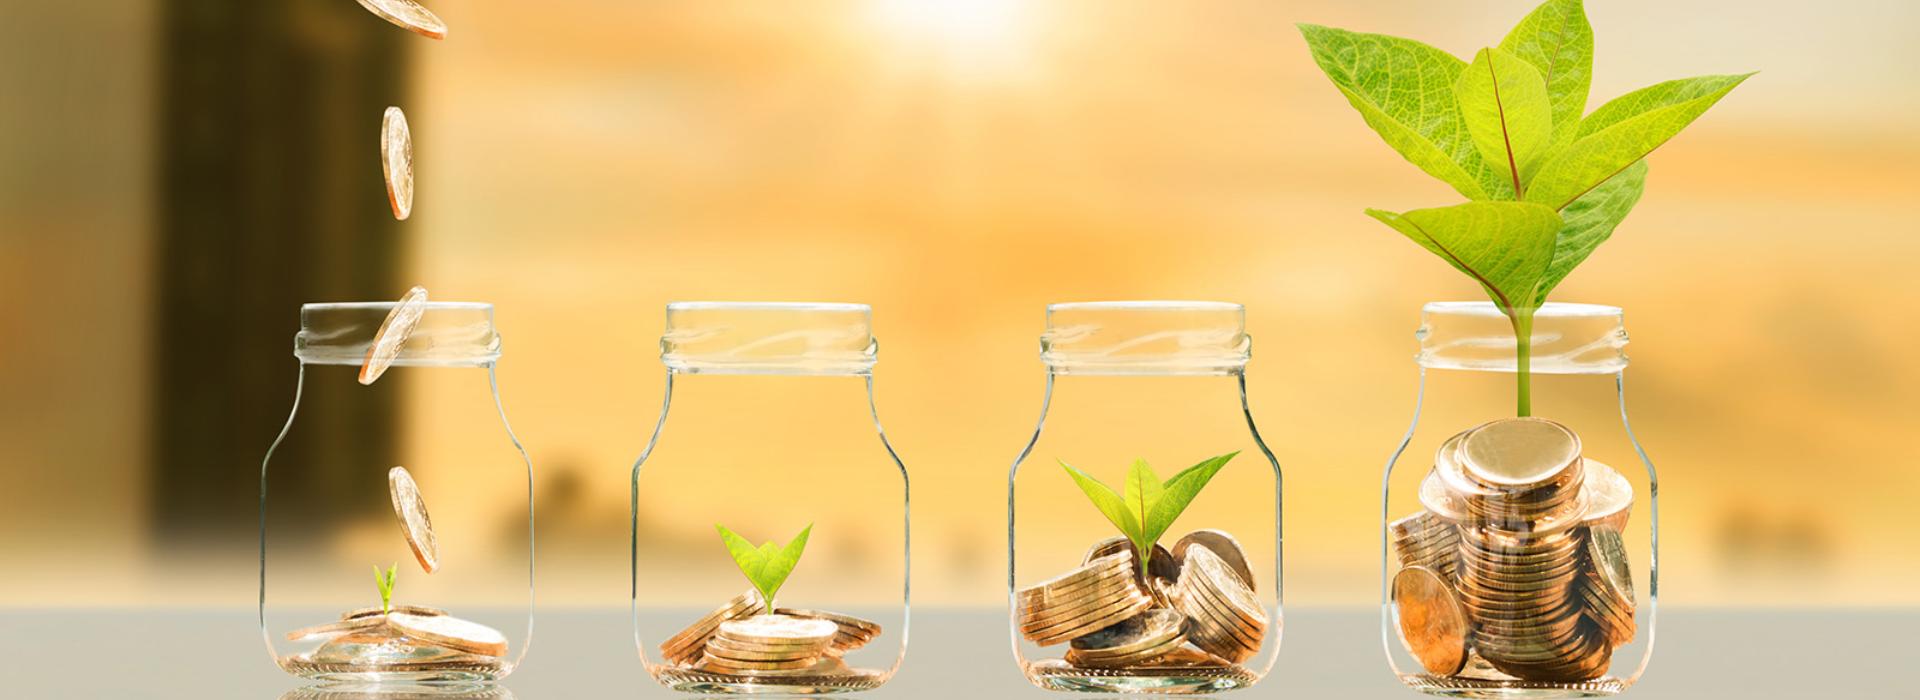 best-investment-pfi-mega-life